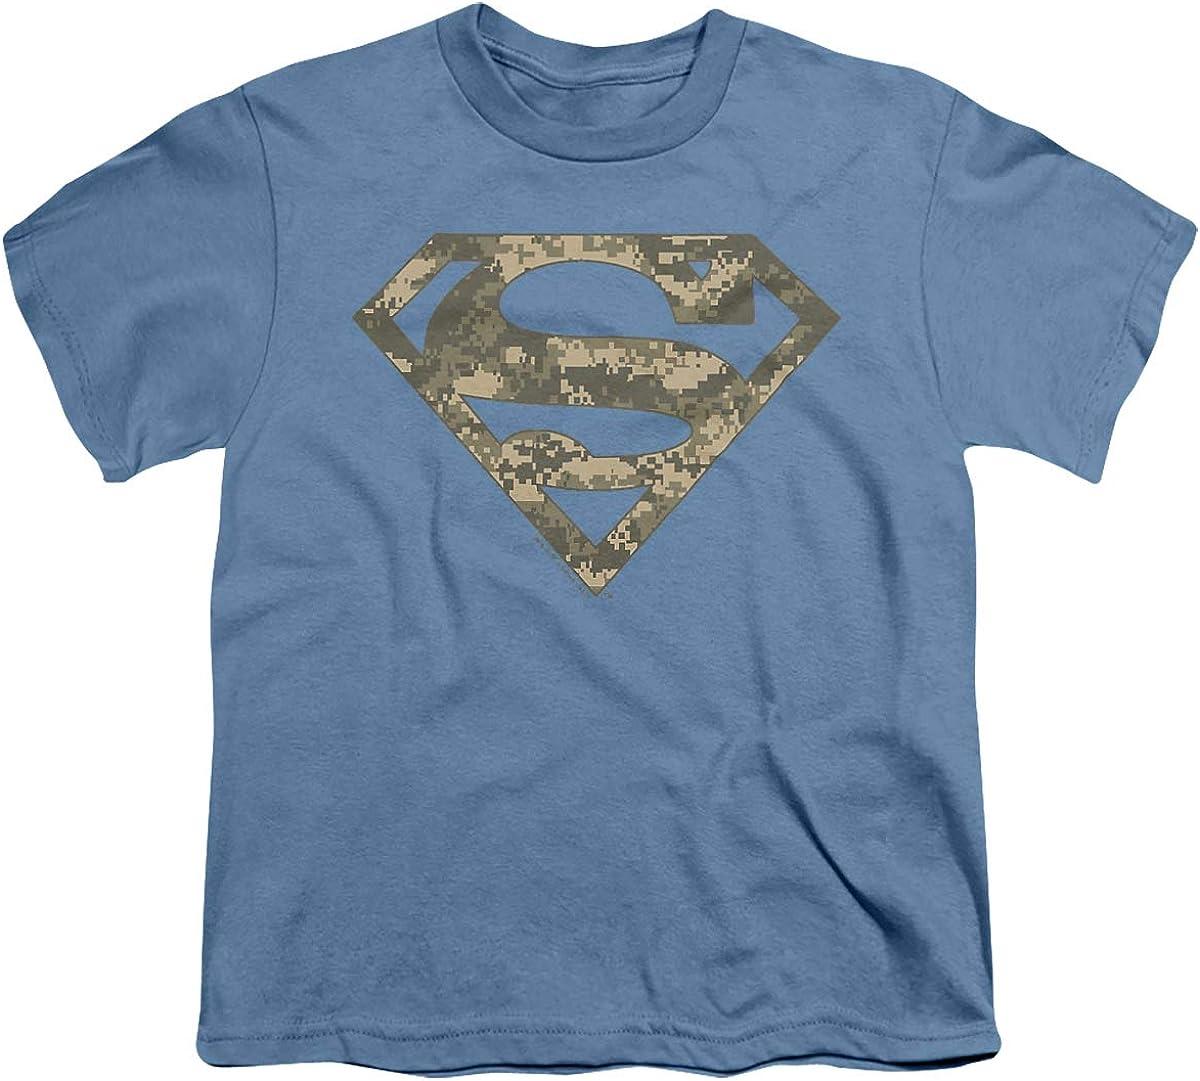 Superman Army Camo Shield Unisex Youth T Shirt, Carolina Blue, Large